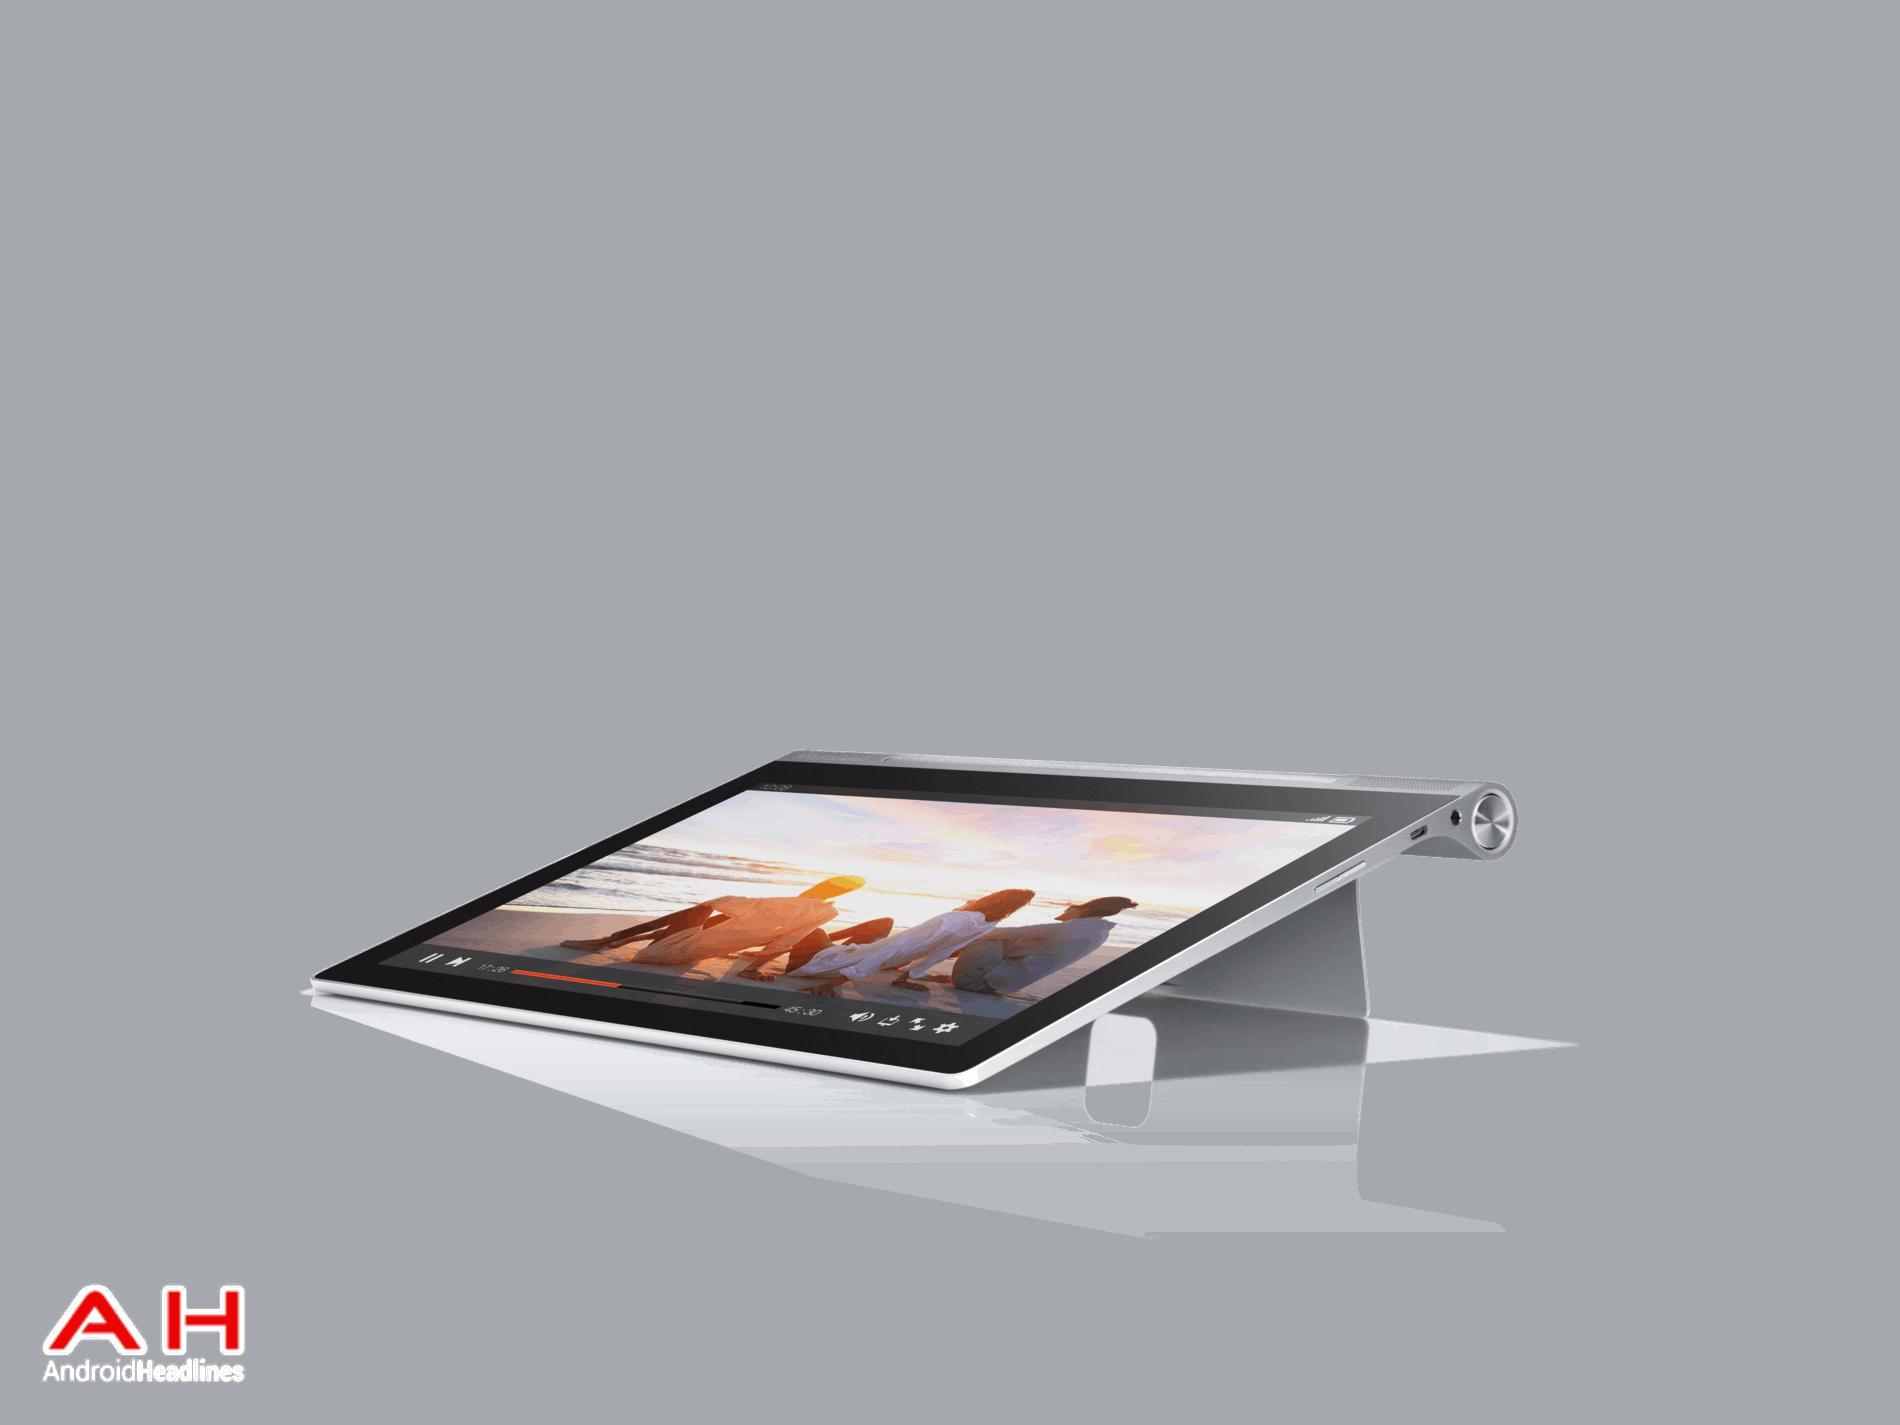 Yoga Tablet 2 Pro 4